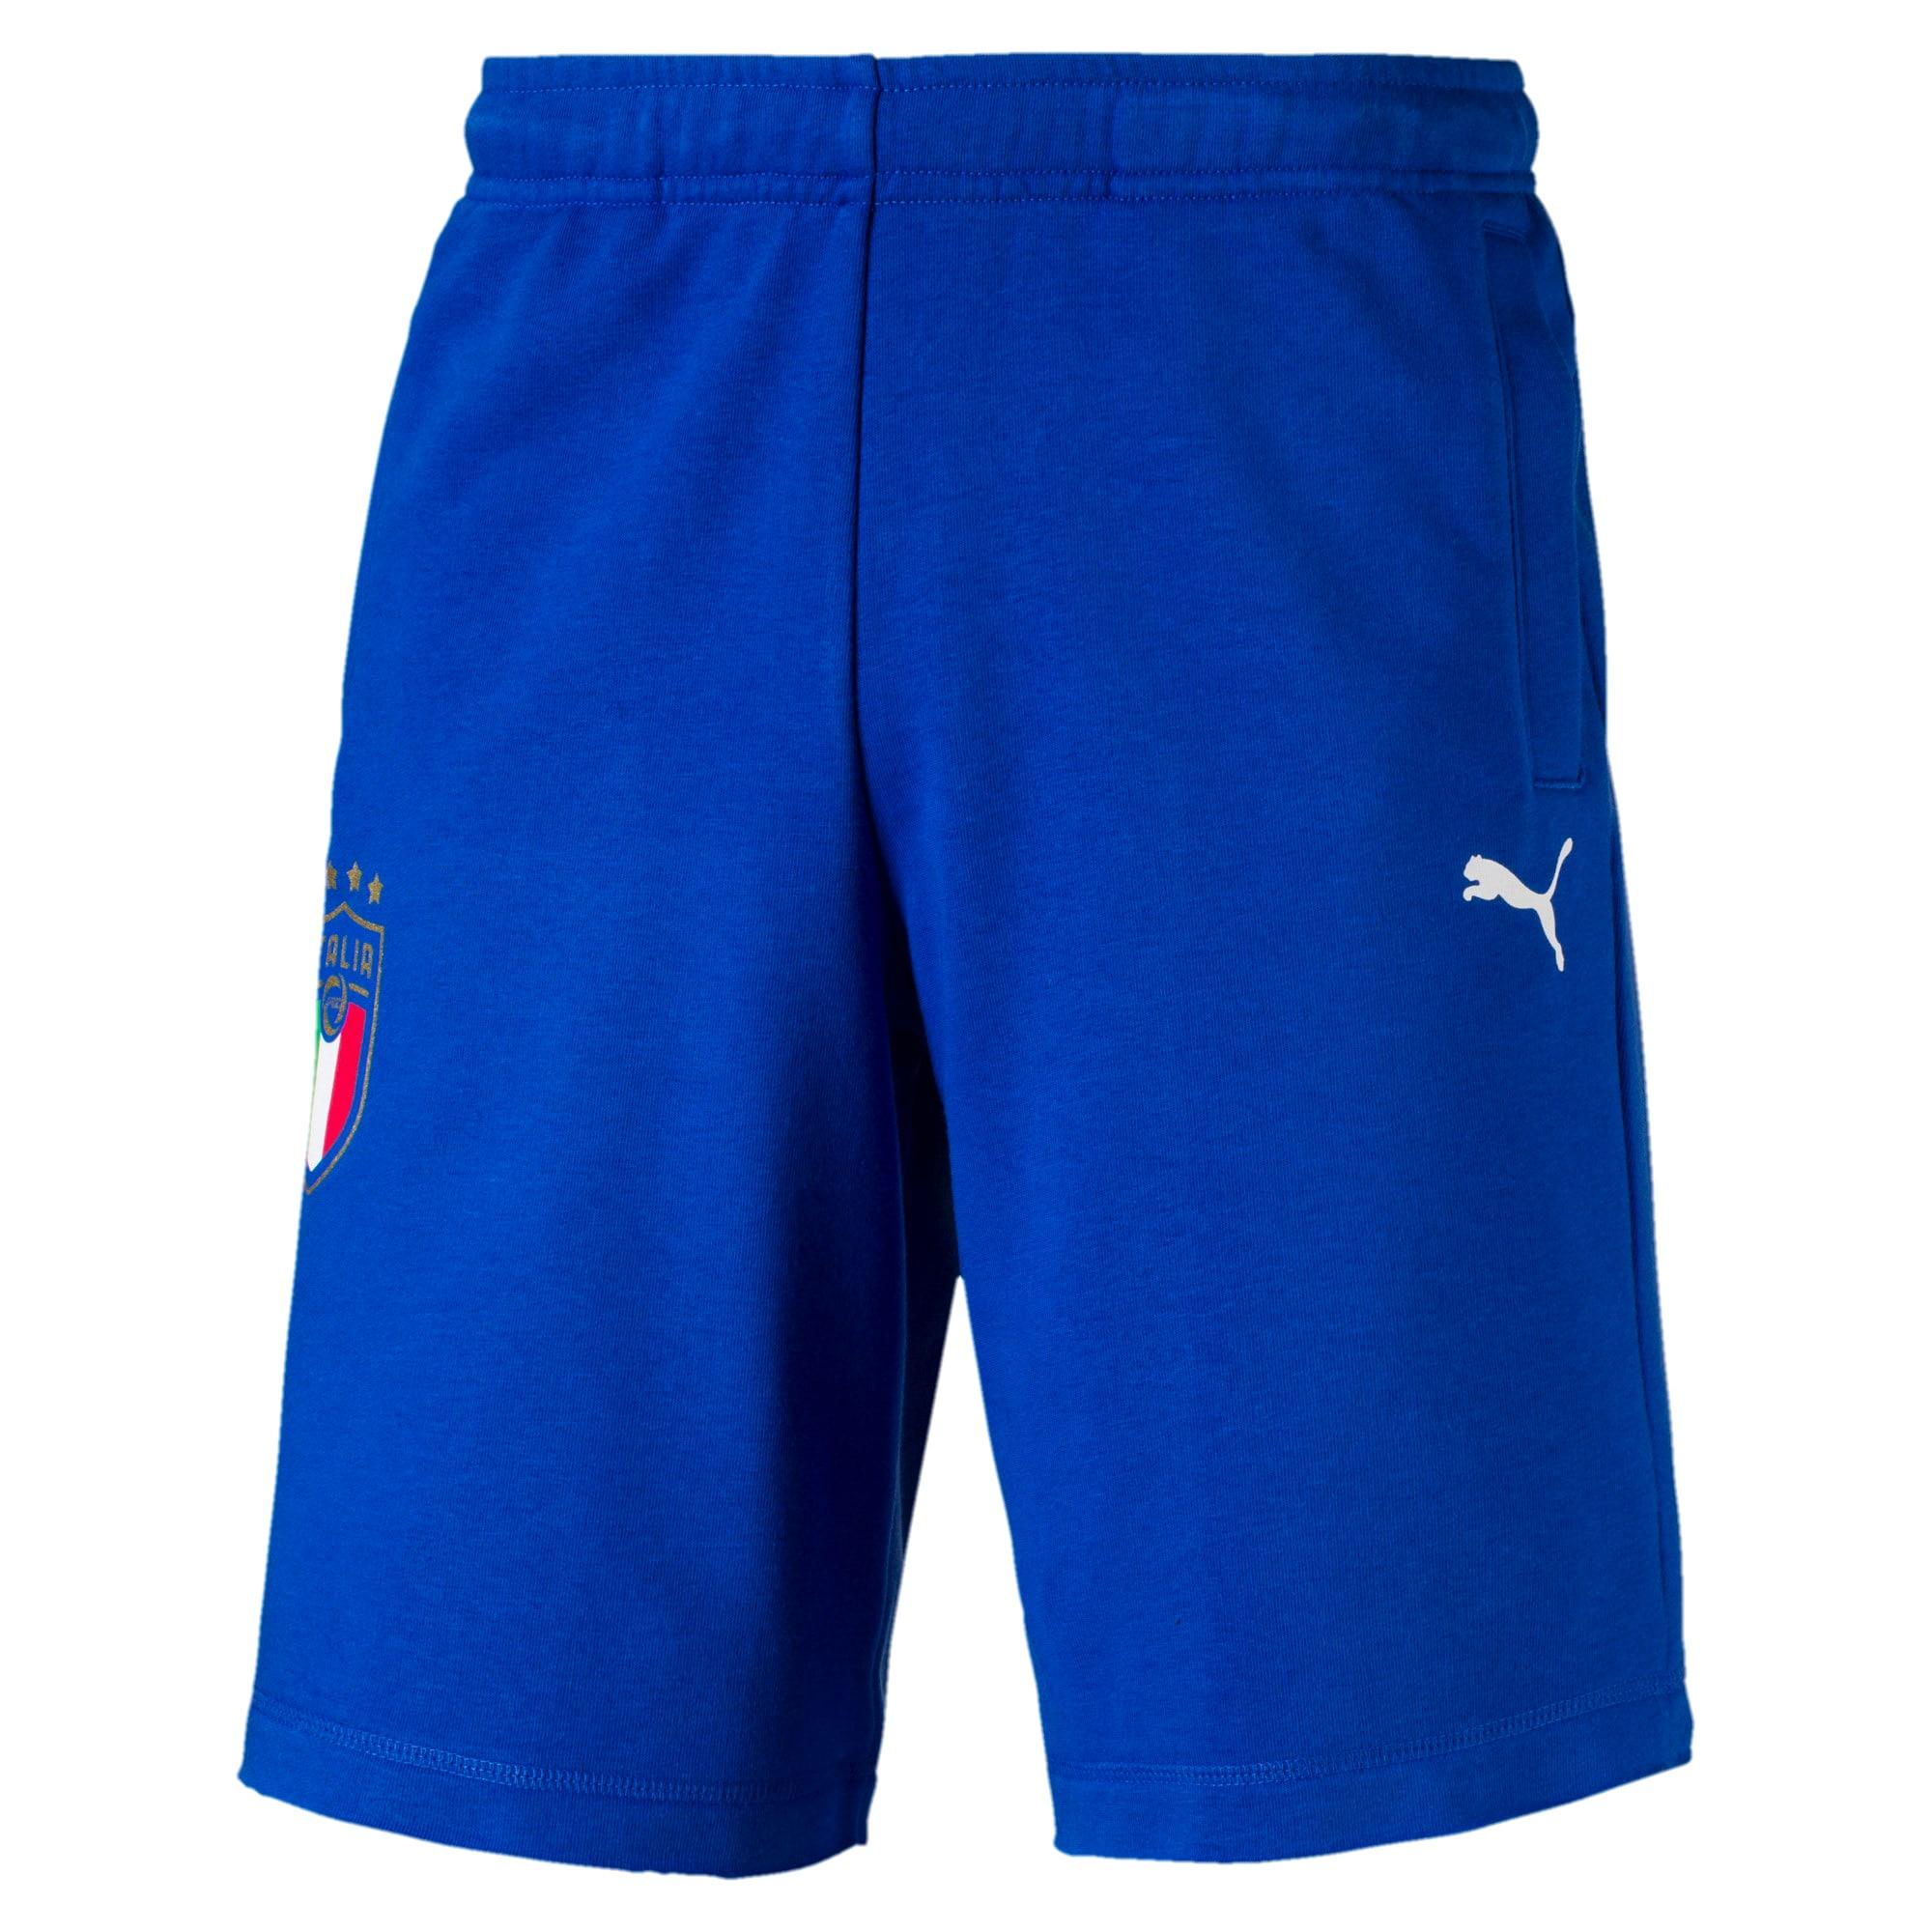 Thumbnail 1 of Short FIGC Italia Bermuda pour homme, Team Power Blue, medium